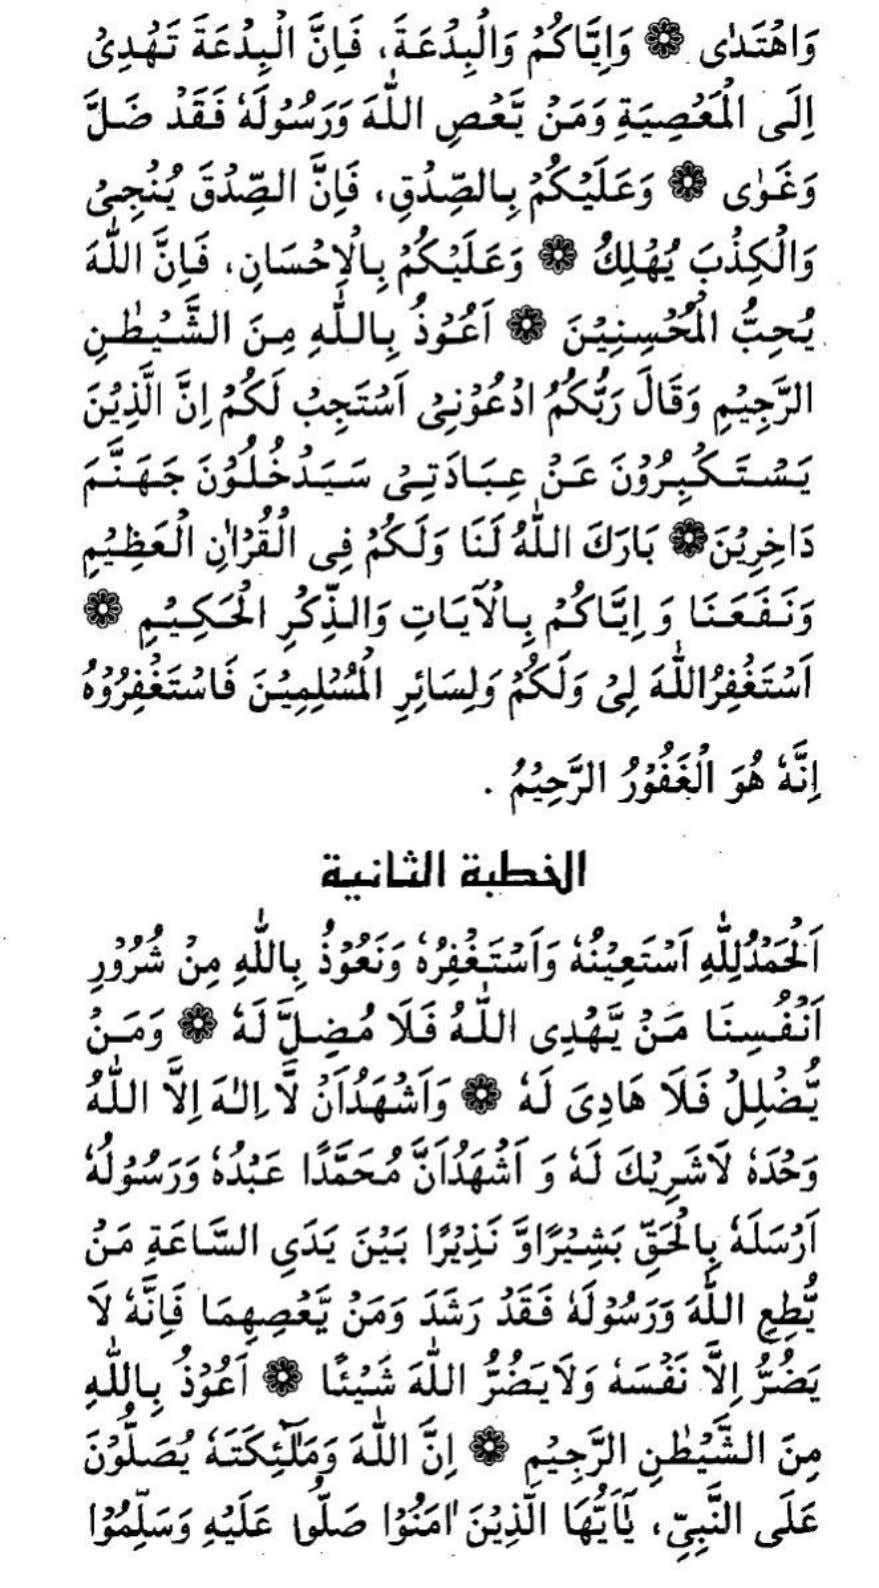 Khutba E Jumah With Urdu Translation Awal Aur Sani In 2020 Quran Quotes Verses Quran Quotes Urdu Love Words